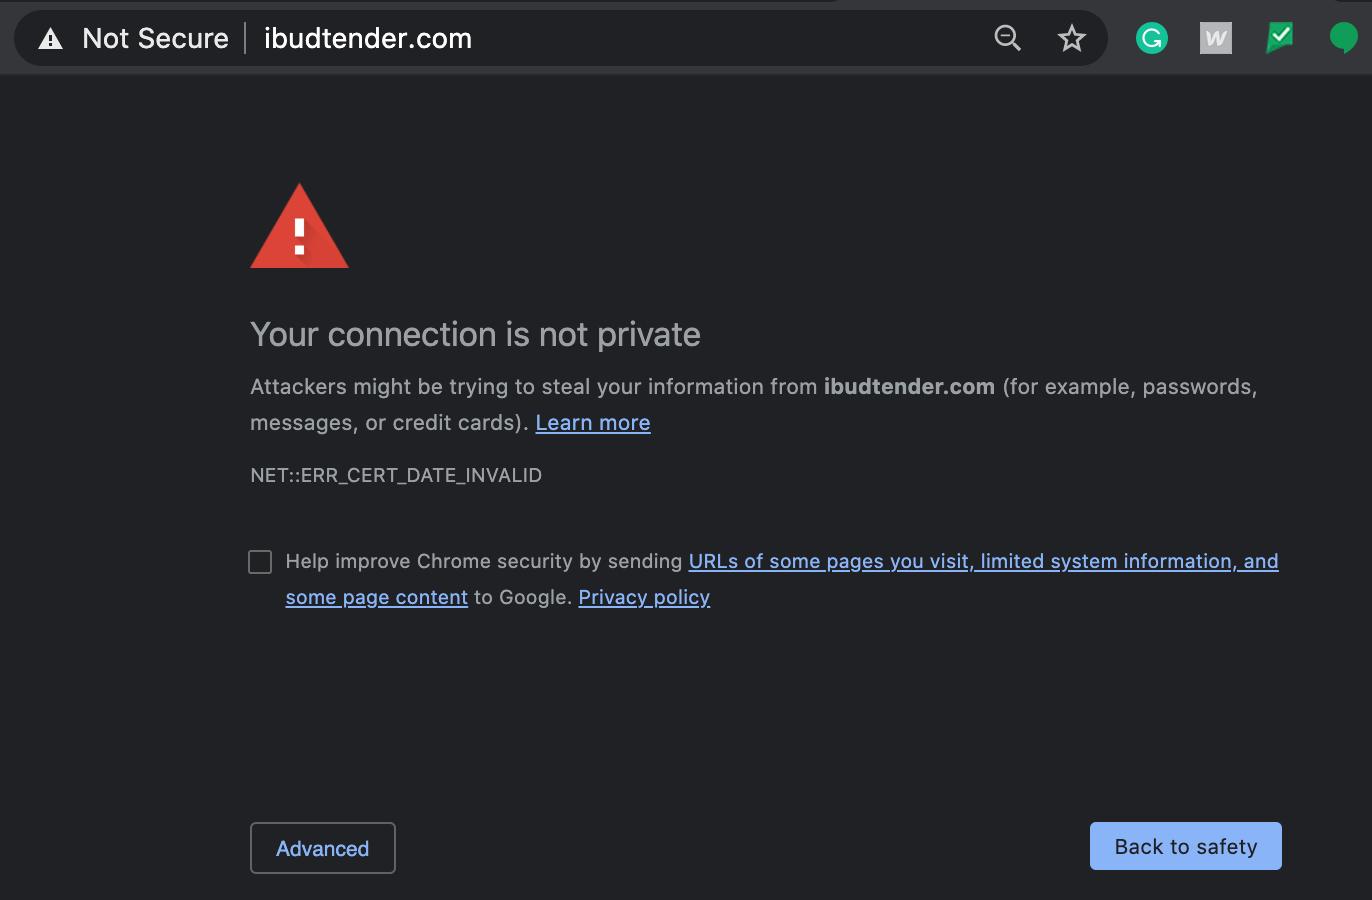 screenshot of ibudtender.com on 6/18/20 showing security warning